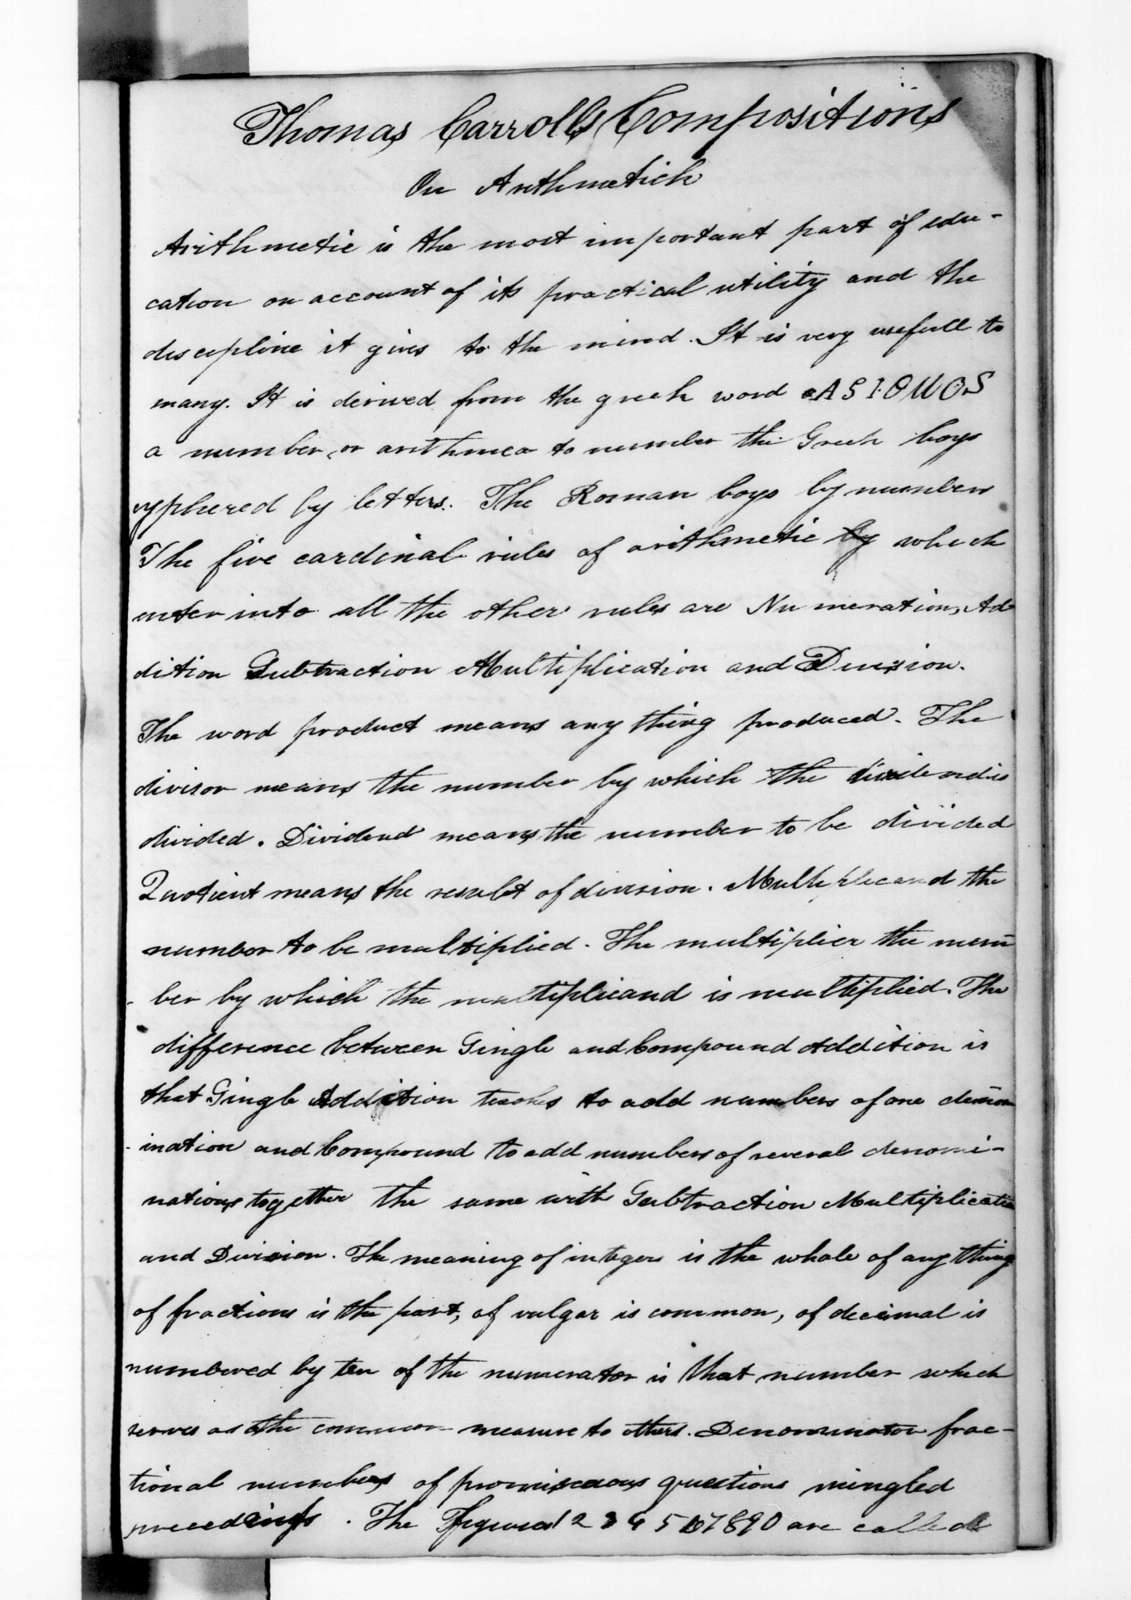 Andrew Jackson - Record Books - Jackson Order Book during the Creek Indian War, Florida, 1812-1813